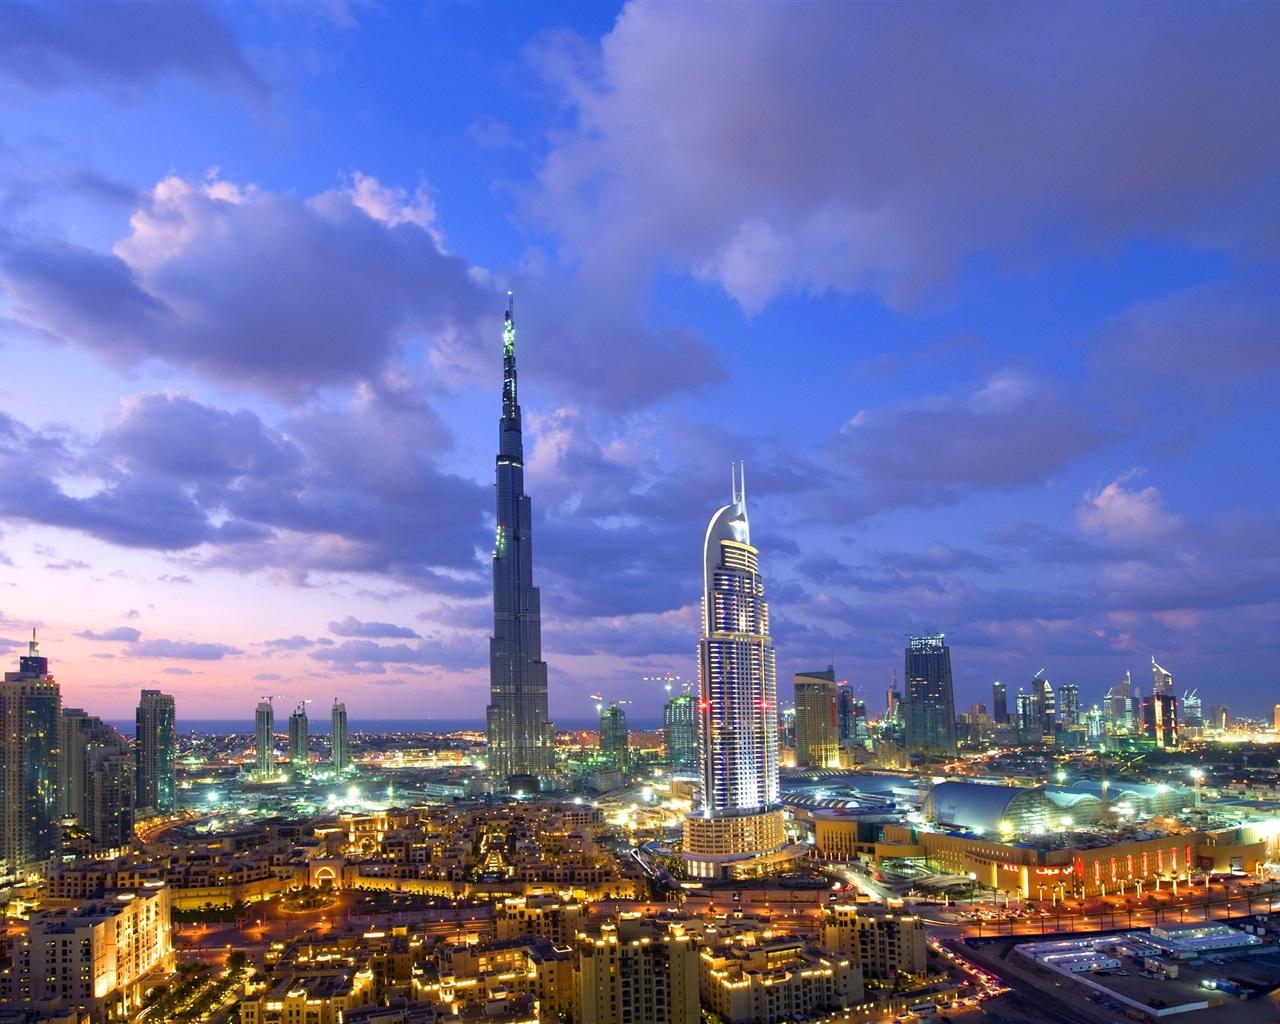 Wallpaper dubai burj khalifa skyscraper nights lights - Dubai burj khalifa hd wallpaper ...